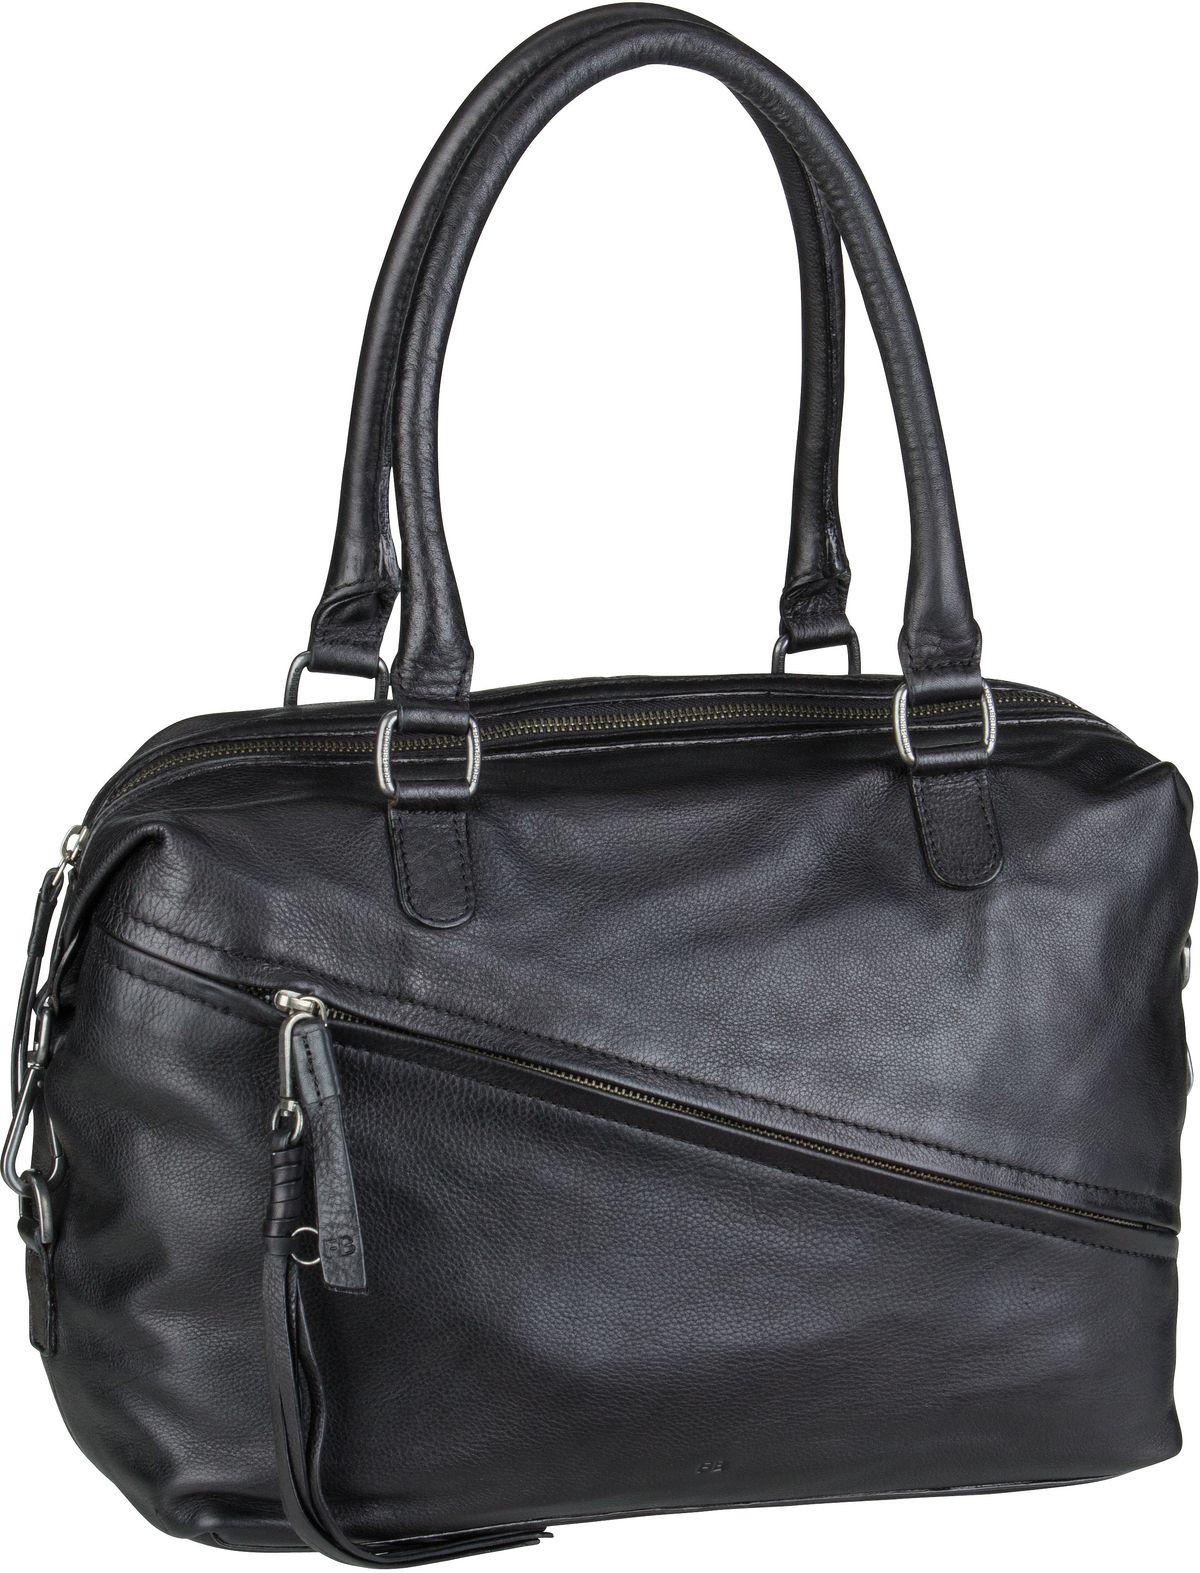 Handtasche Lucky Black